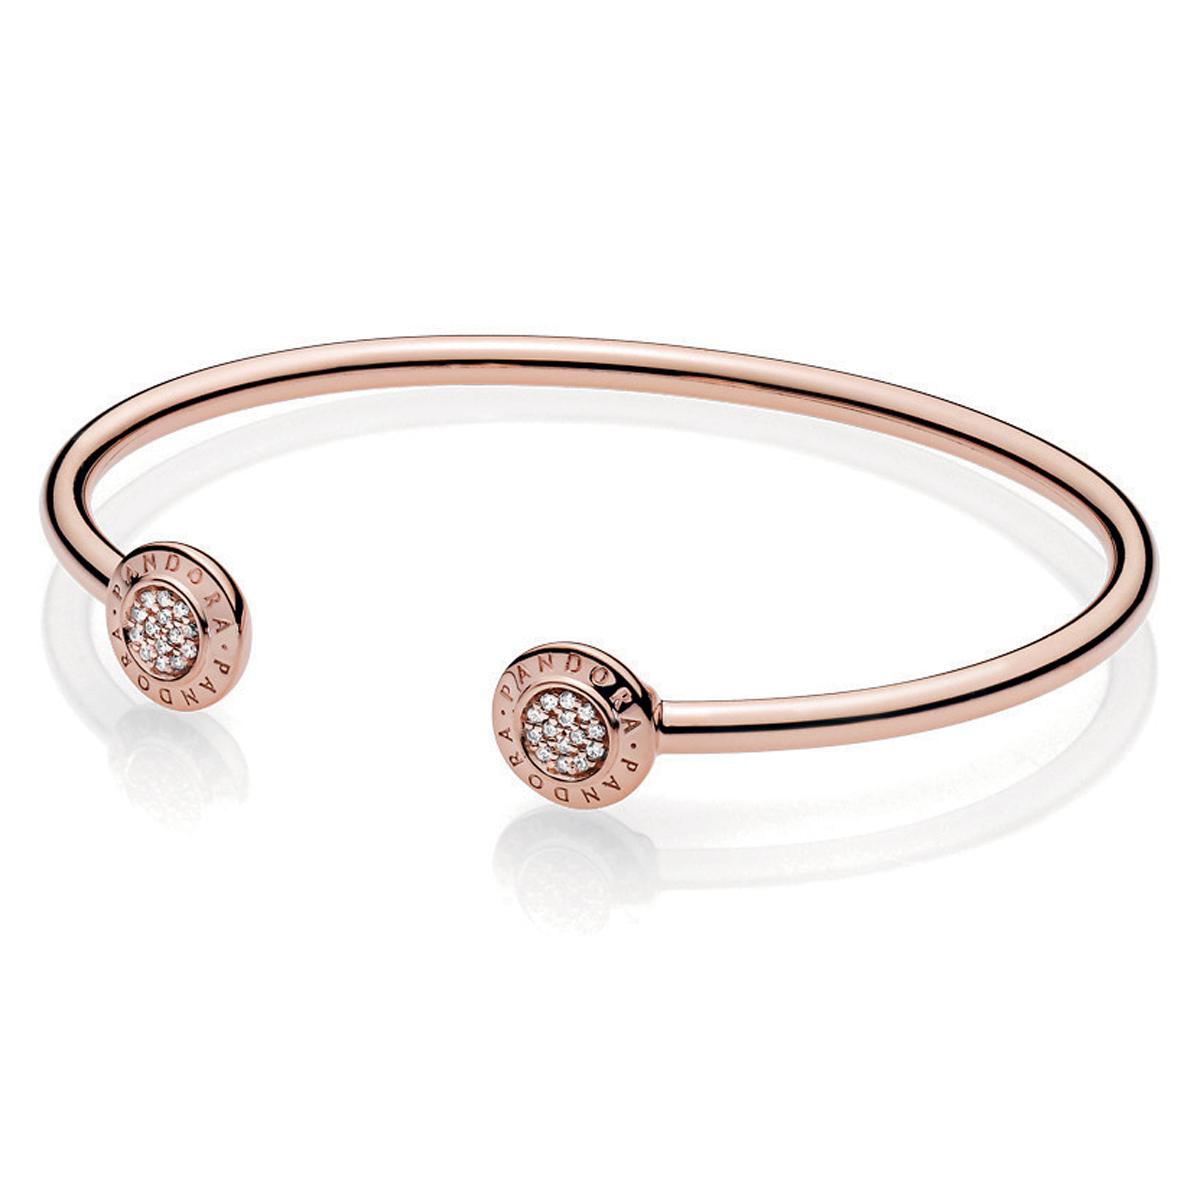 bdc185354 PANDORA Rose™ Signature Open Bangle Bracelet